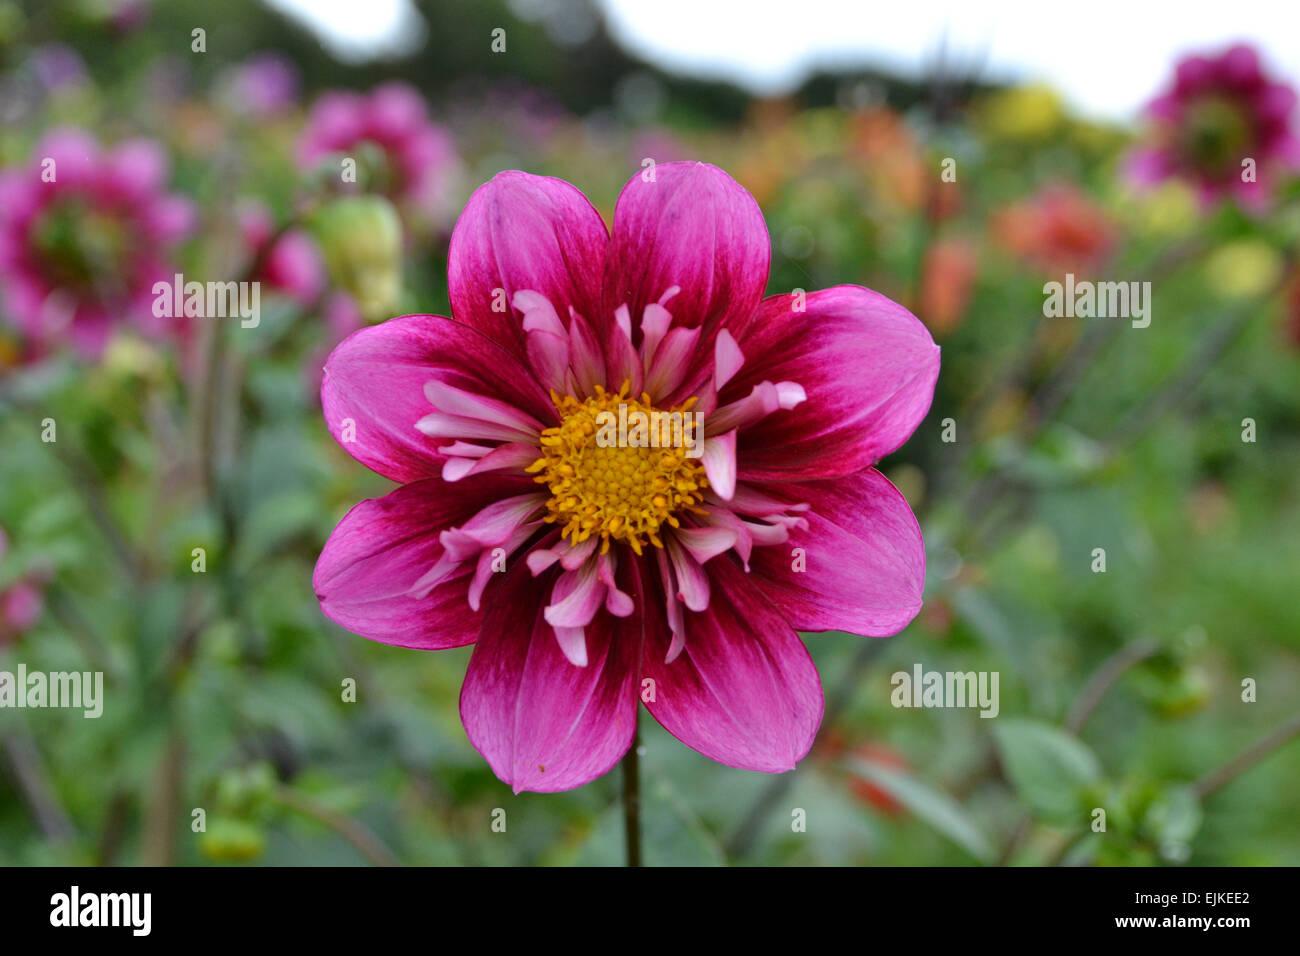 Close up of purple collerette Dahlia - Stock Image